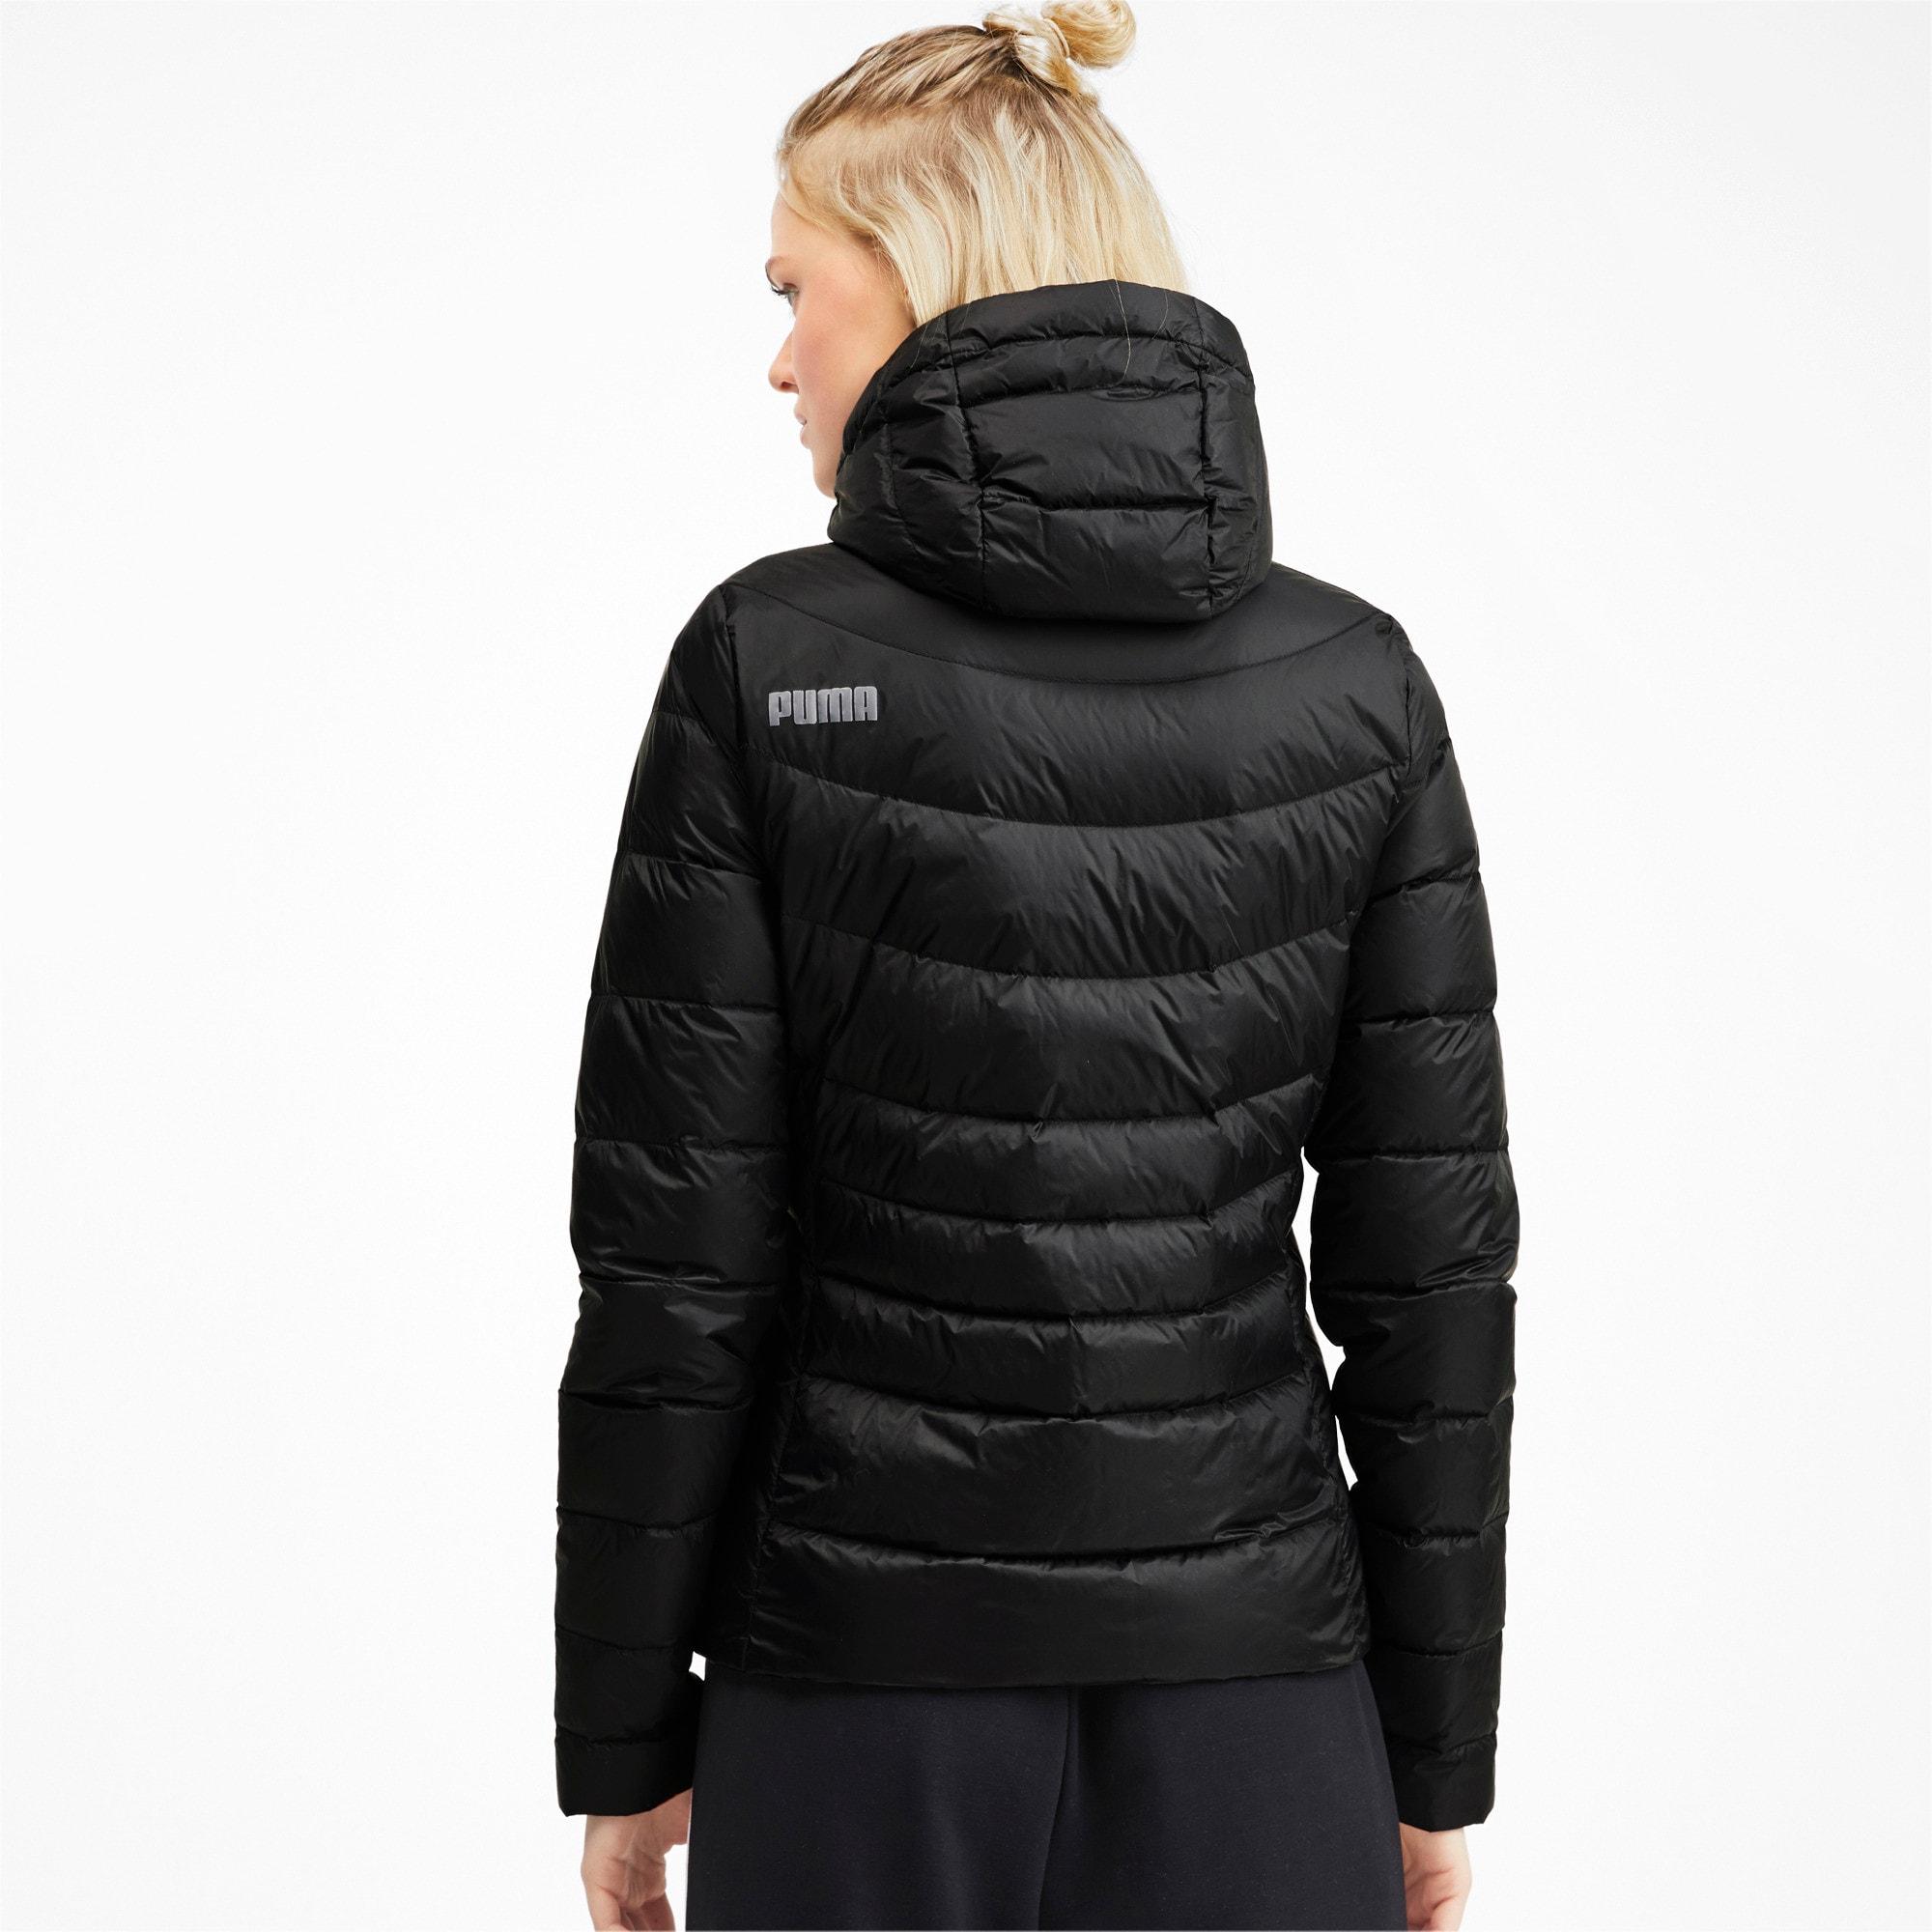 Thumbnail 2 of PWRWarm packLITE Down Women's Jacket, Puma Black, medium